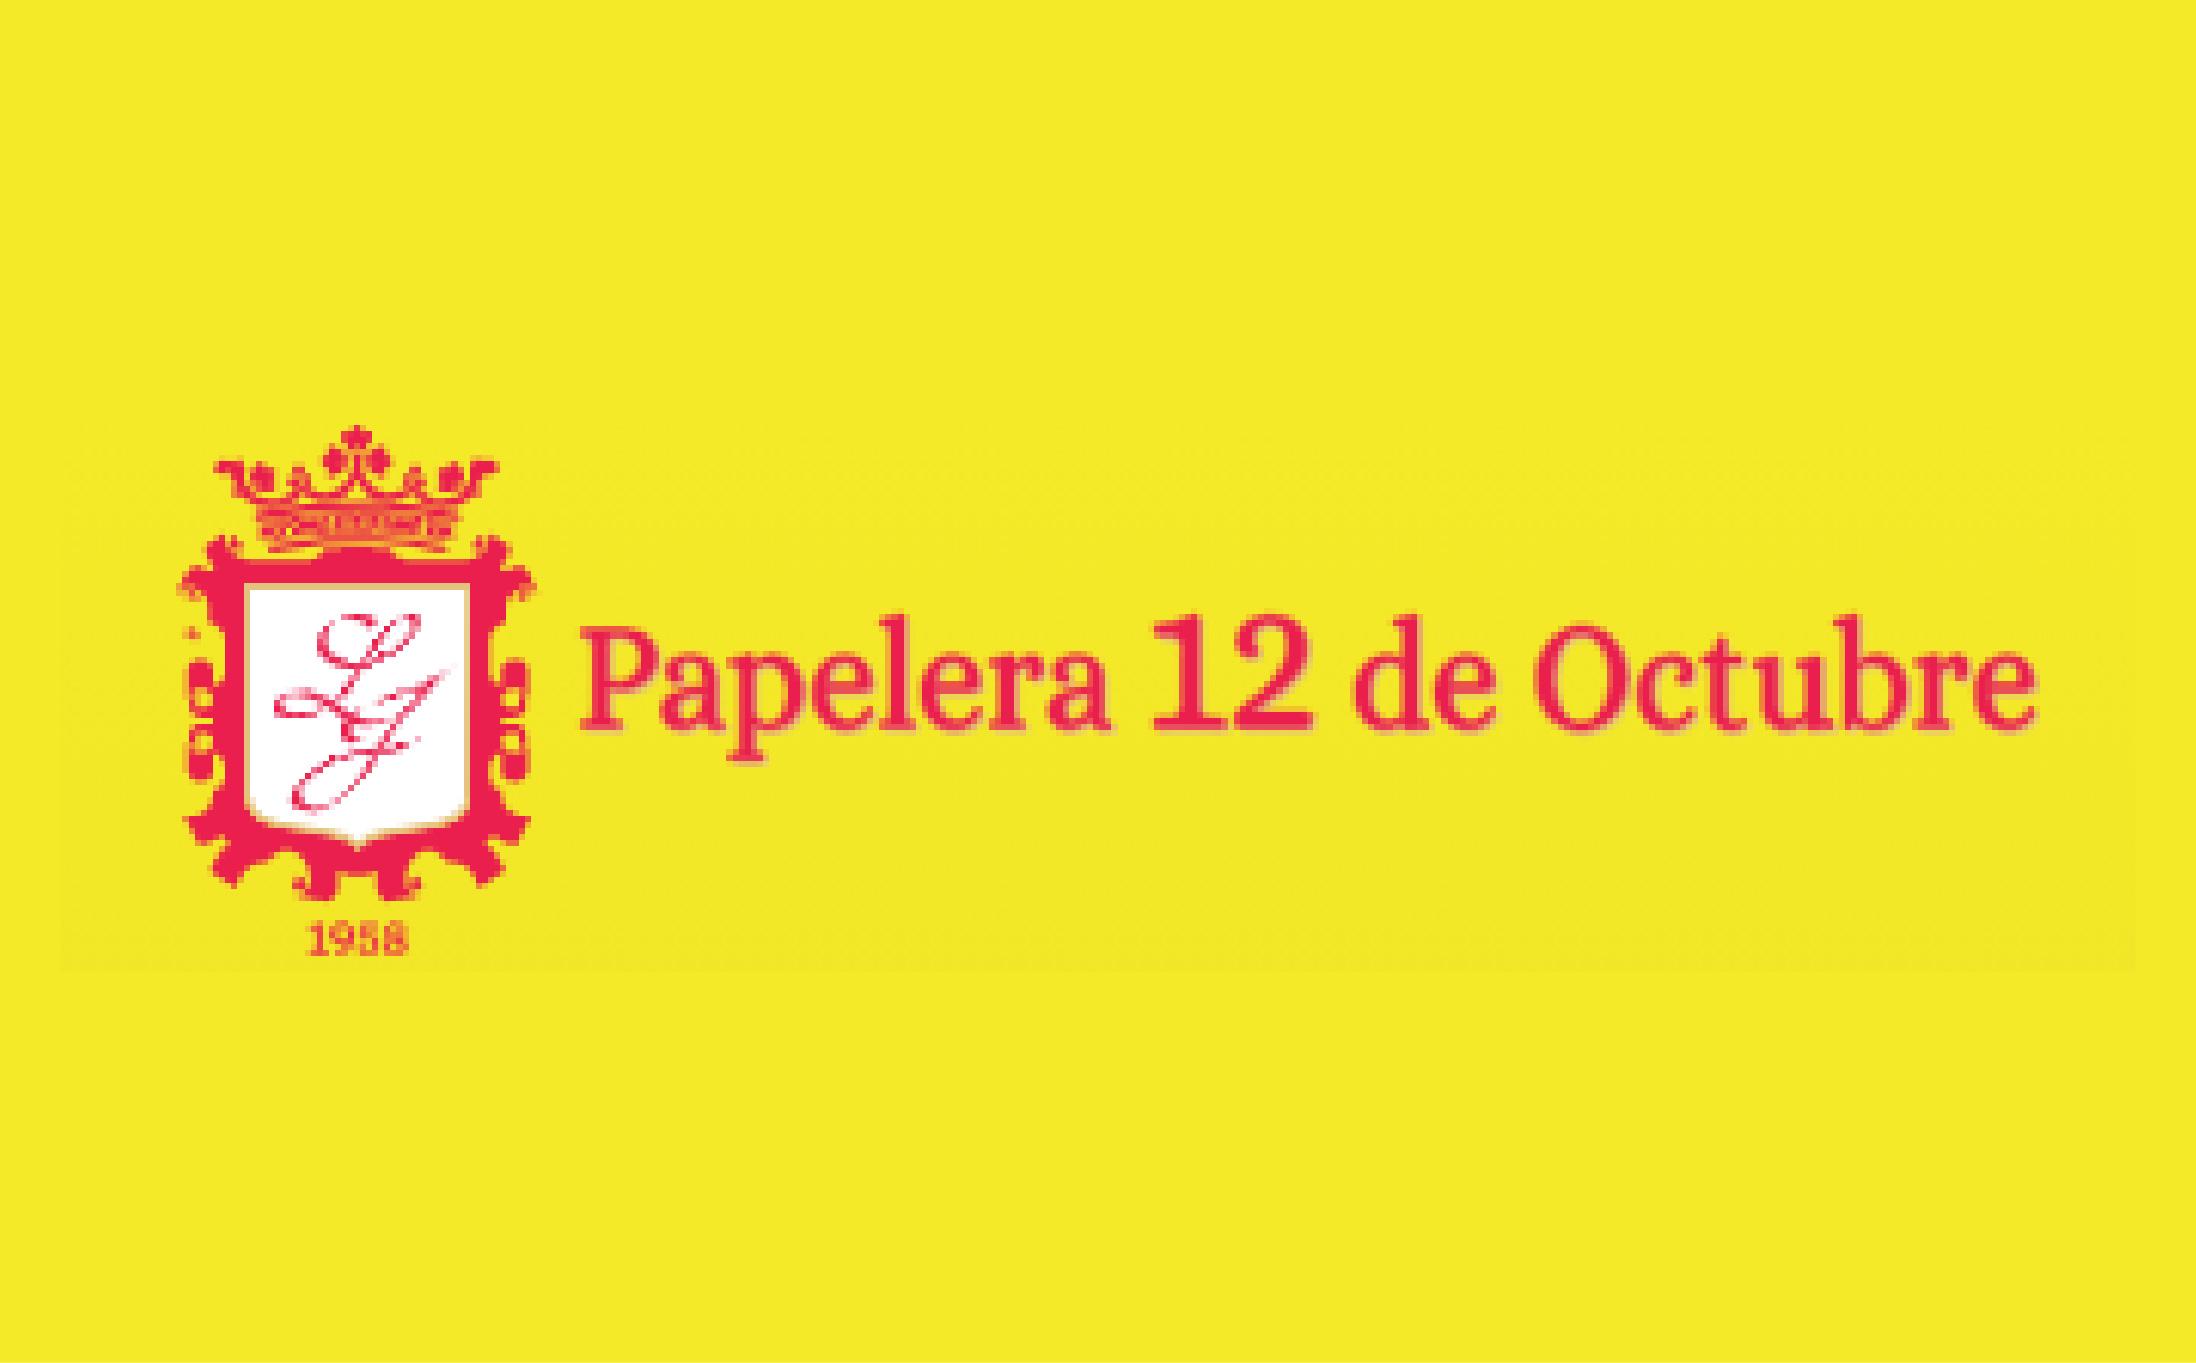 Papelera 12 de Octubre - Logo